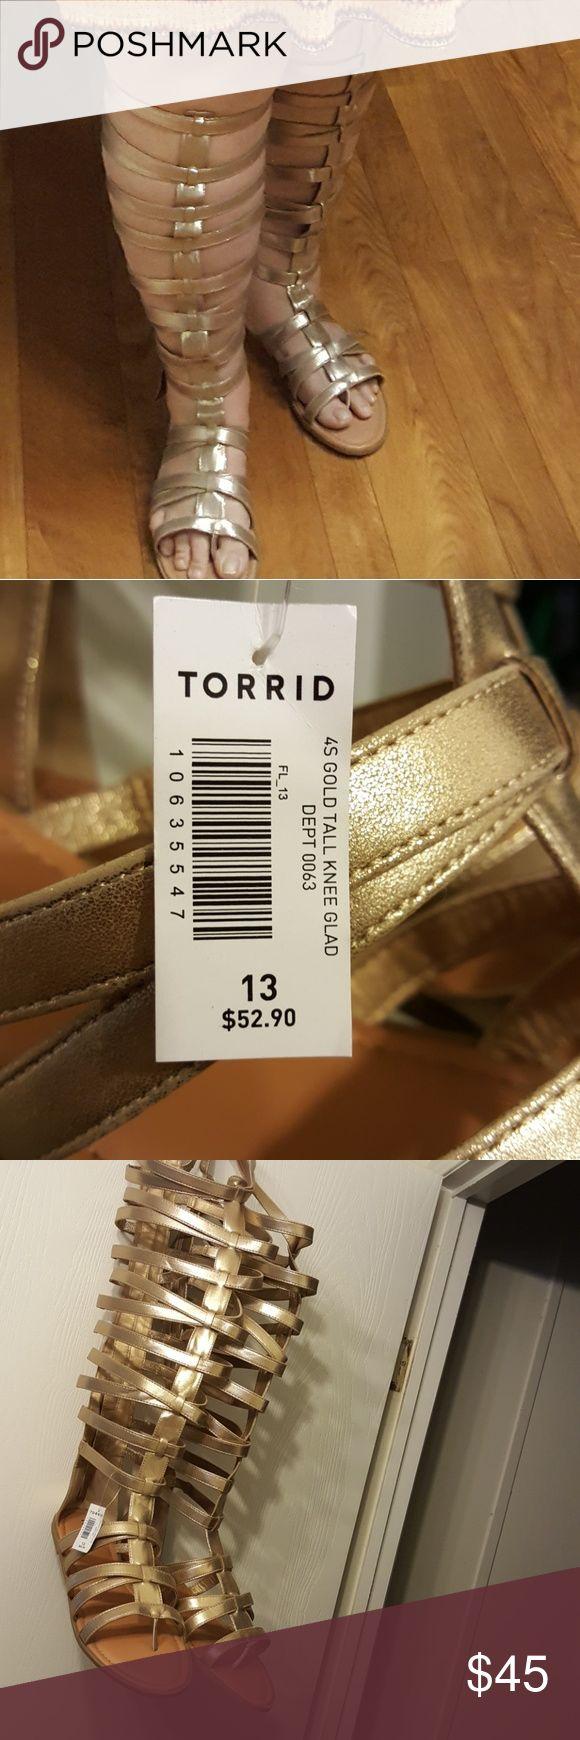 Size 13 Gold Tall knee Torrid Gladiators Size 13 Gold Tall knee Torrid Gladiators torrid Shoes Sandals